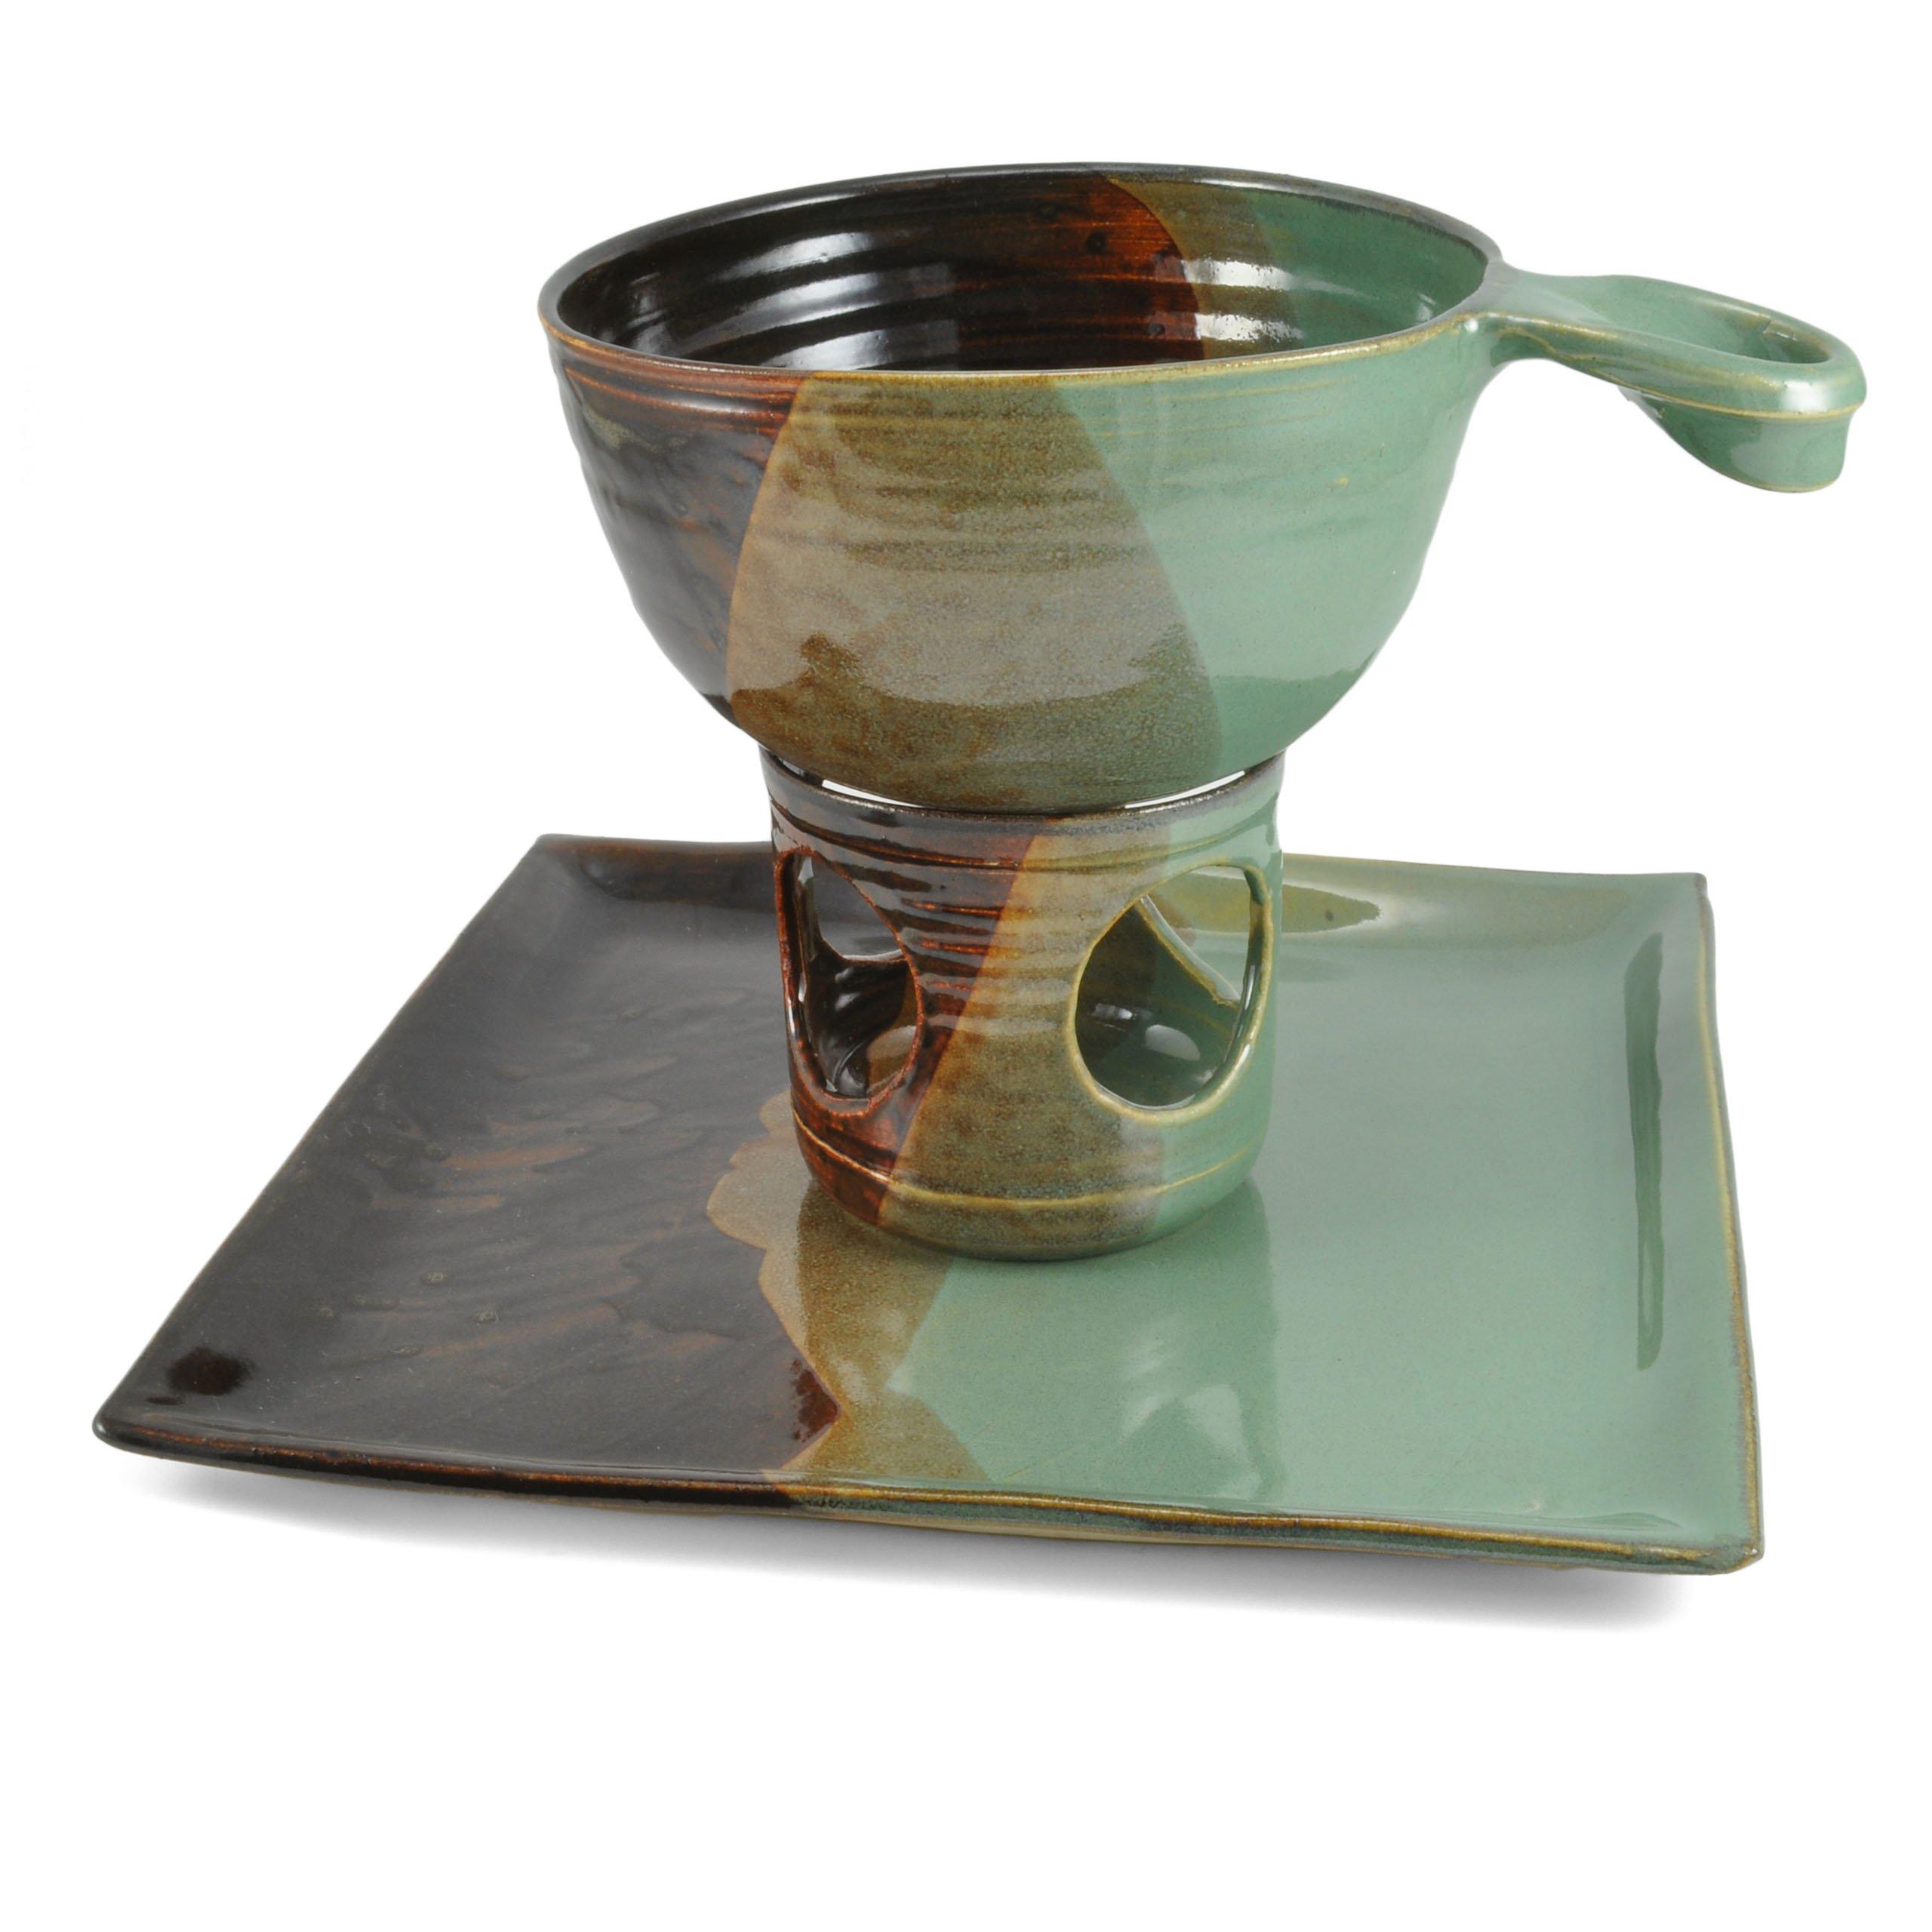 Holman Pottery Handmade Ceramic 3-piece Fondue Set, Green Earth